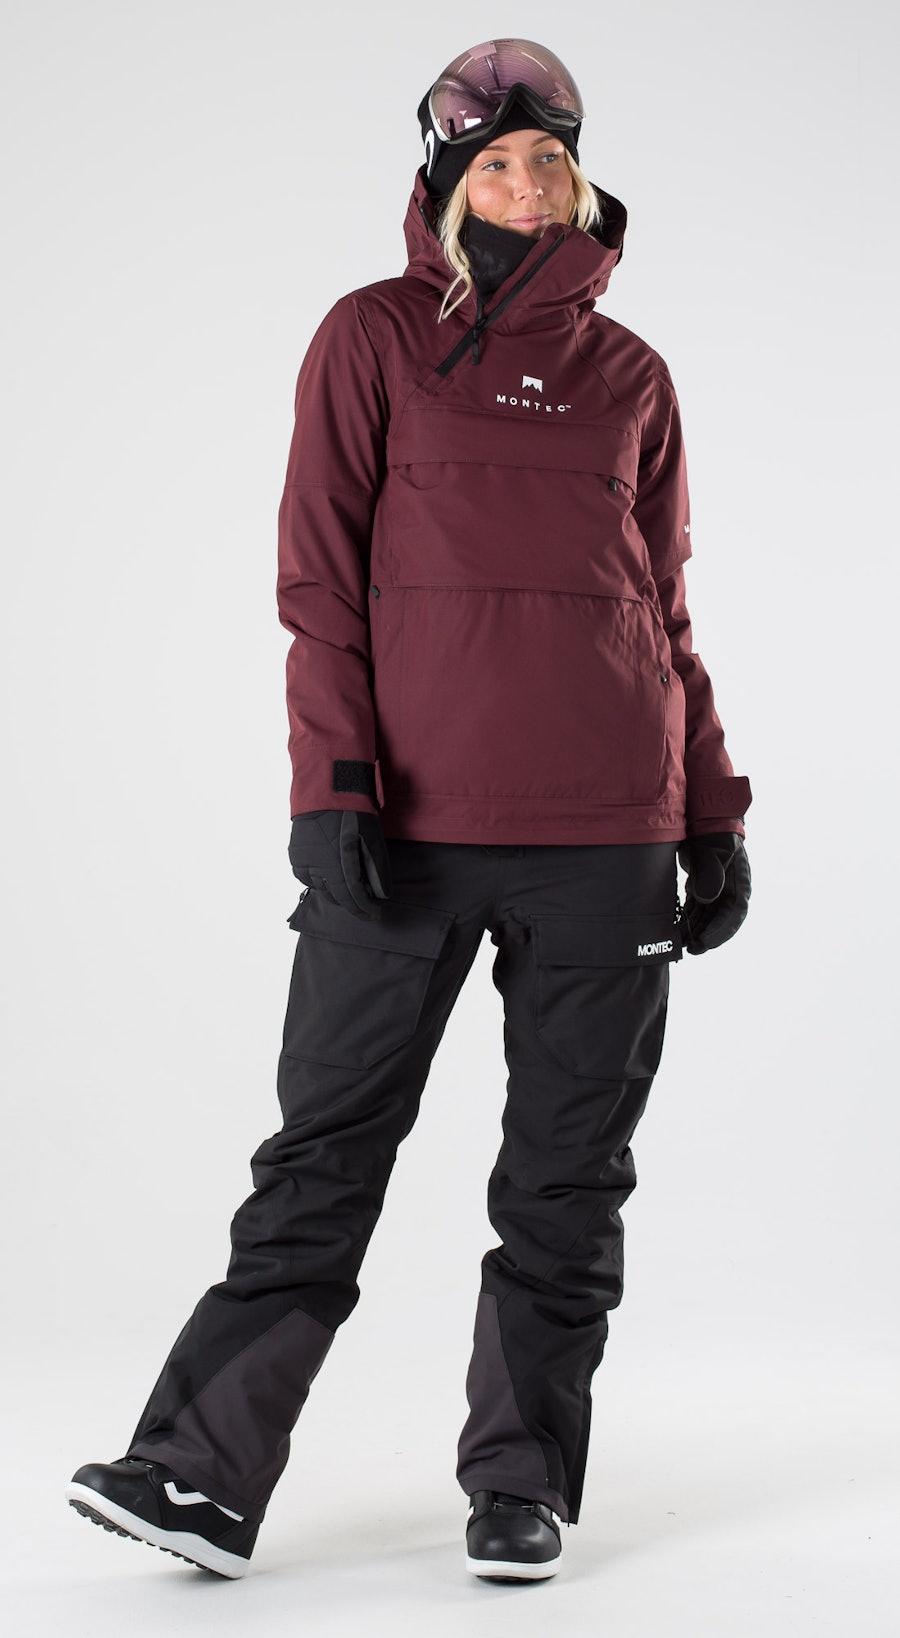 Montec Dune W Burgundy Snowboard clothing Multi